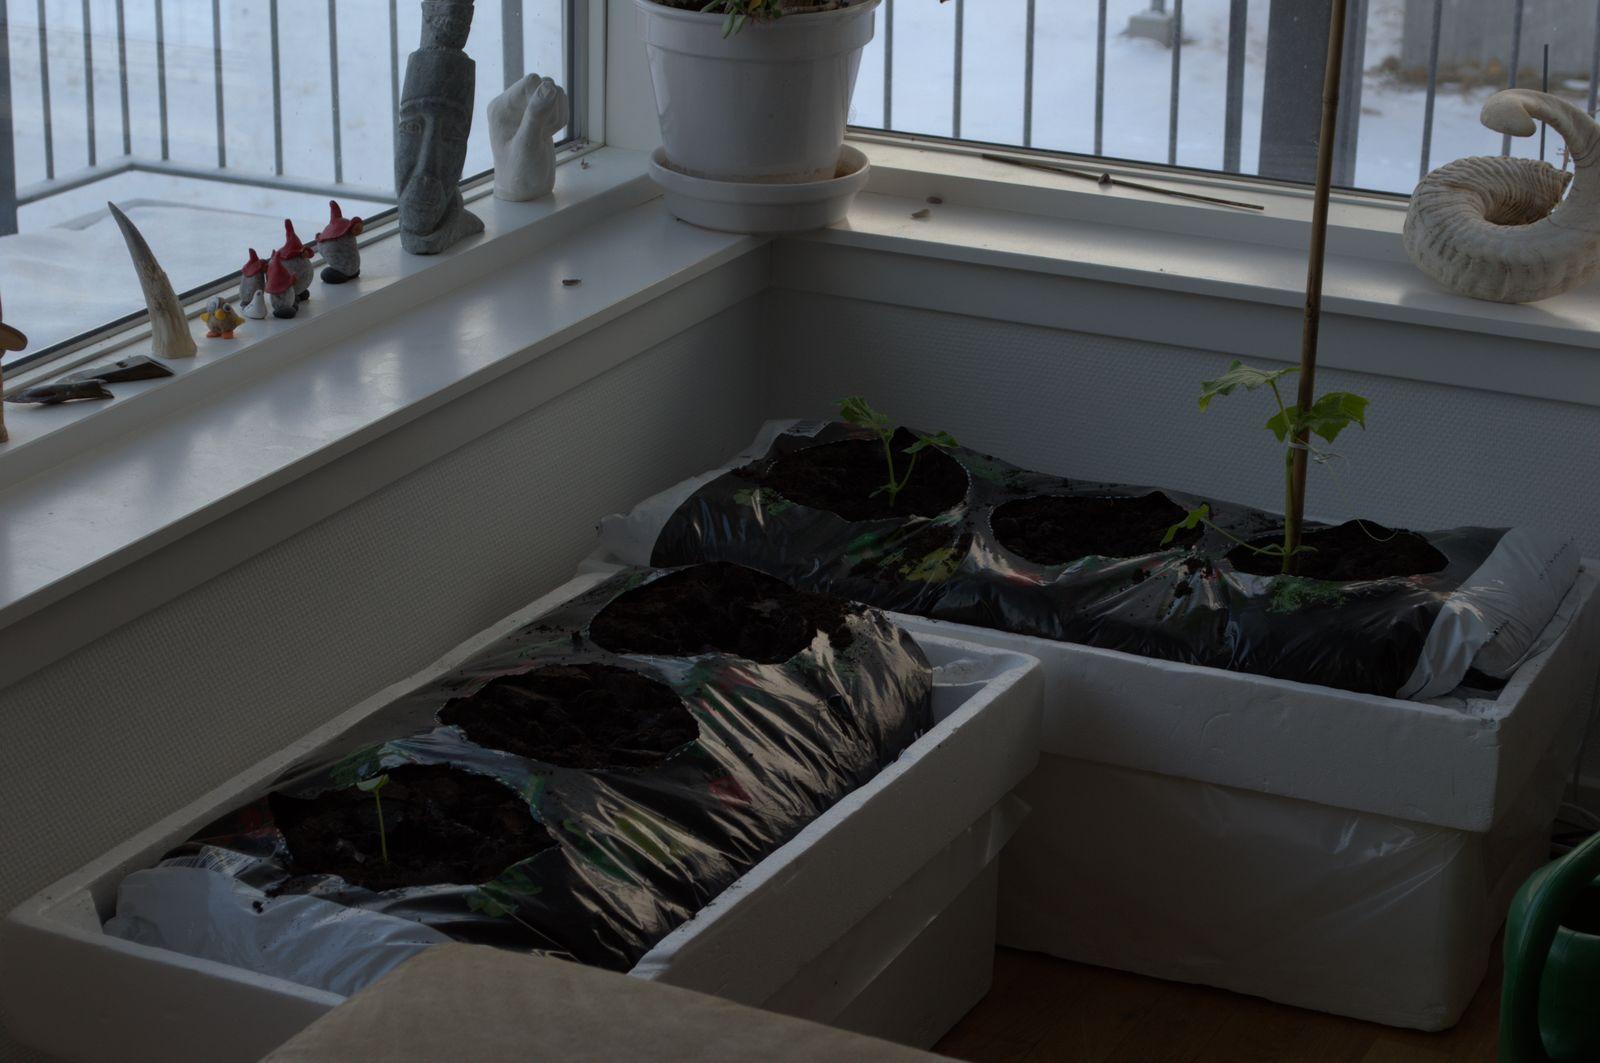 2014-03-27-0824_-_Agurkeplante_Planter_Roed-peber